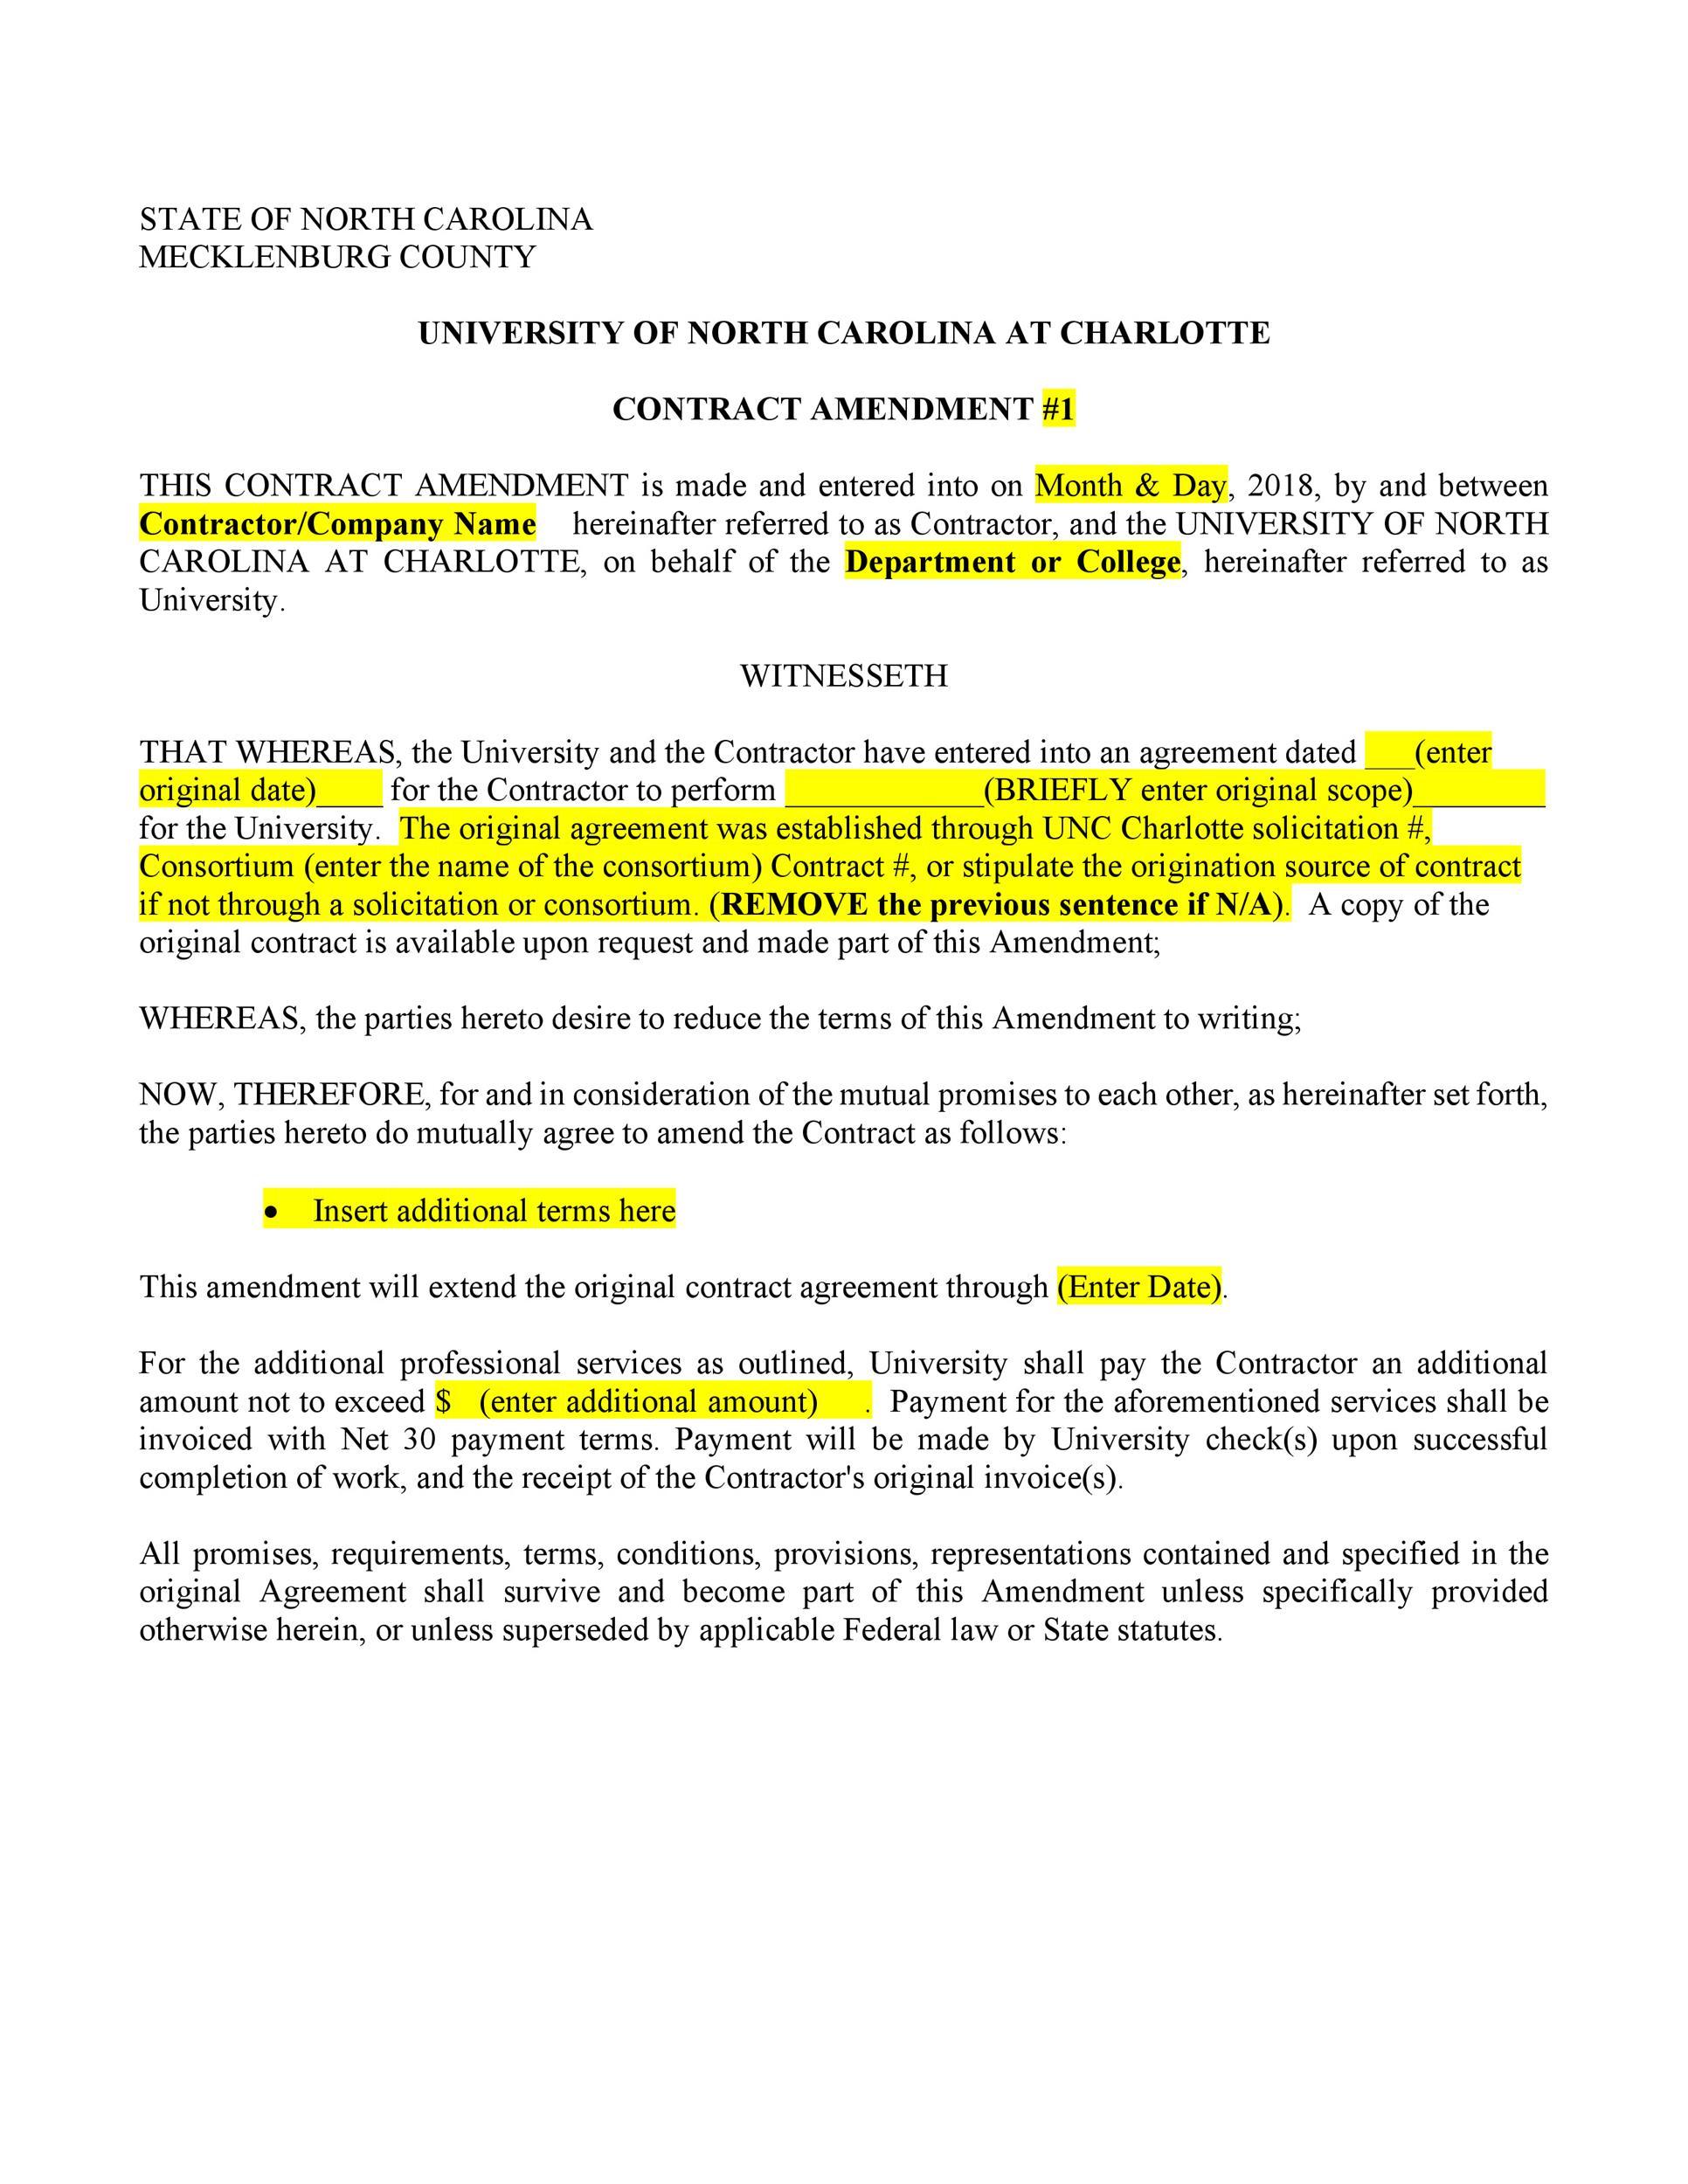 Free contract amendment 25